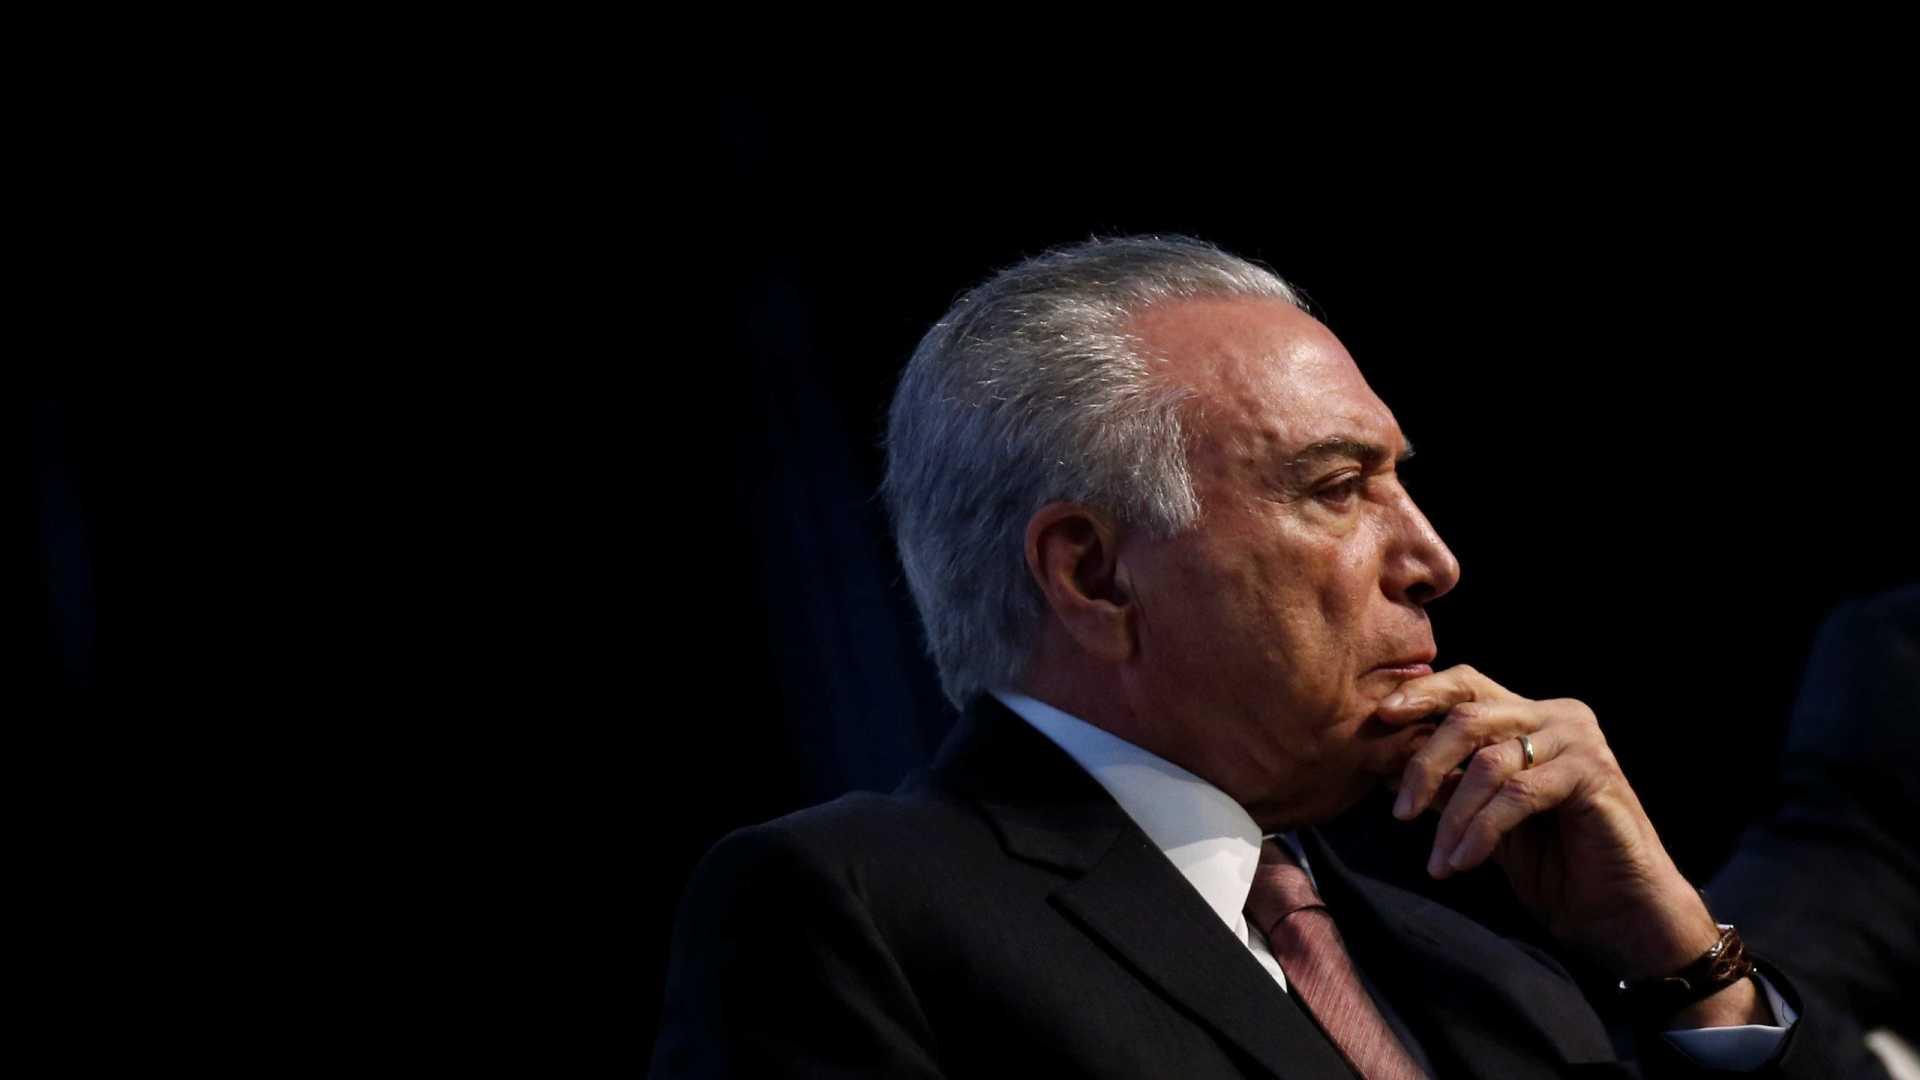 db71fb0f90d69 REUTERS   Adriano Machado (Foto de arquivo) - PB VALE